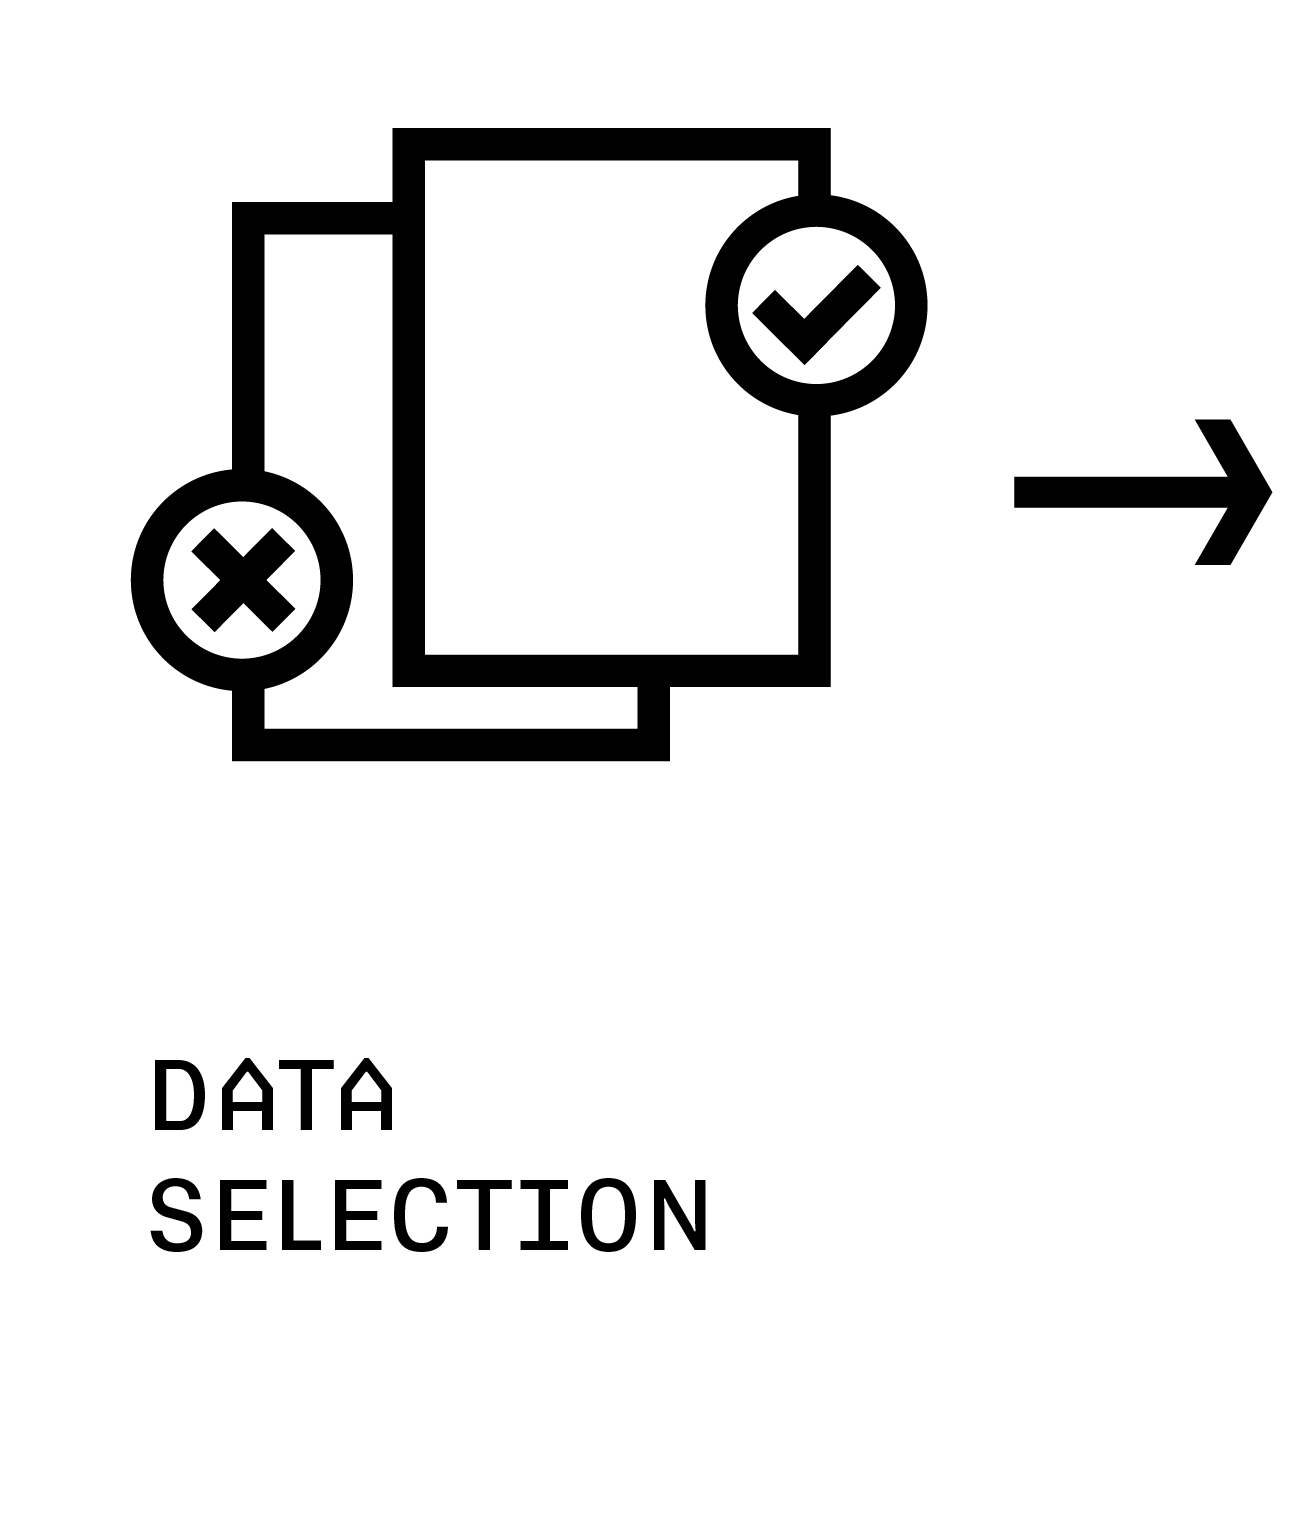 Data Selection icon